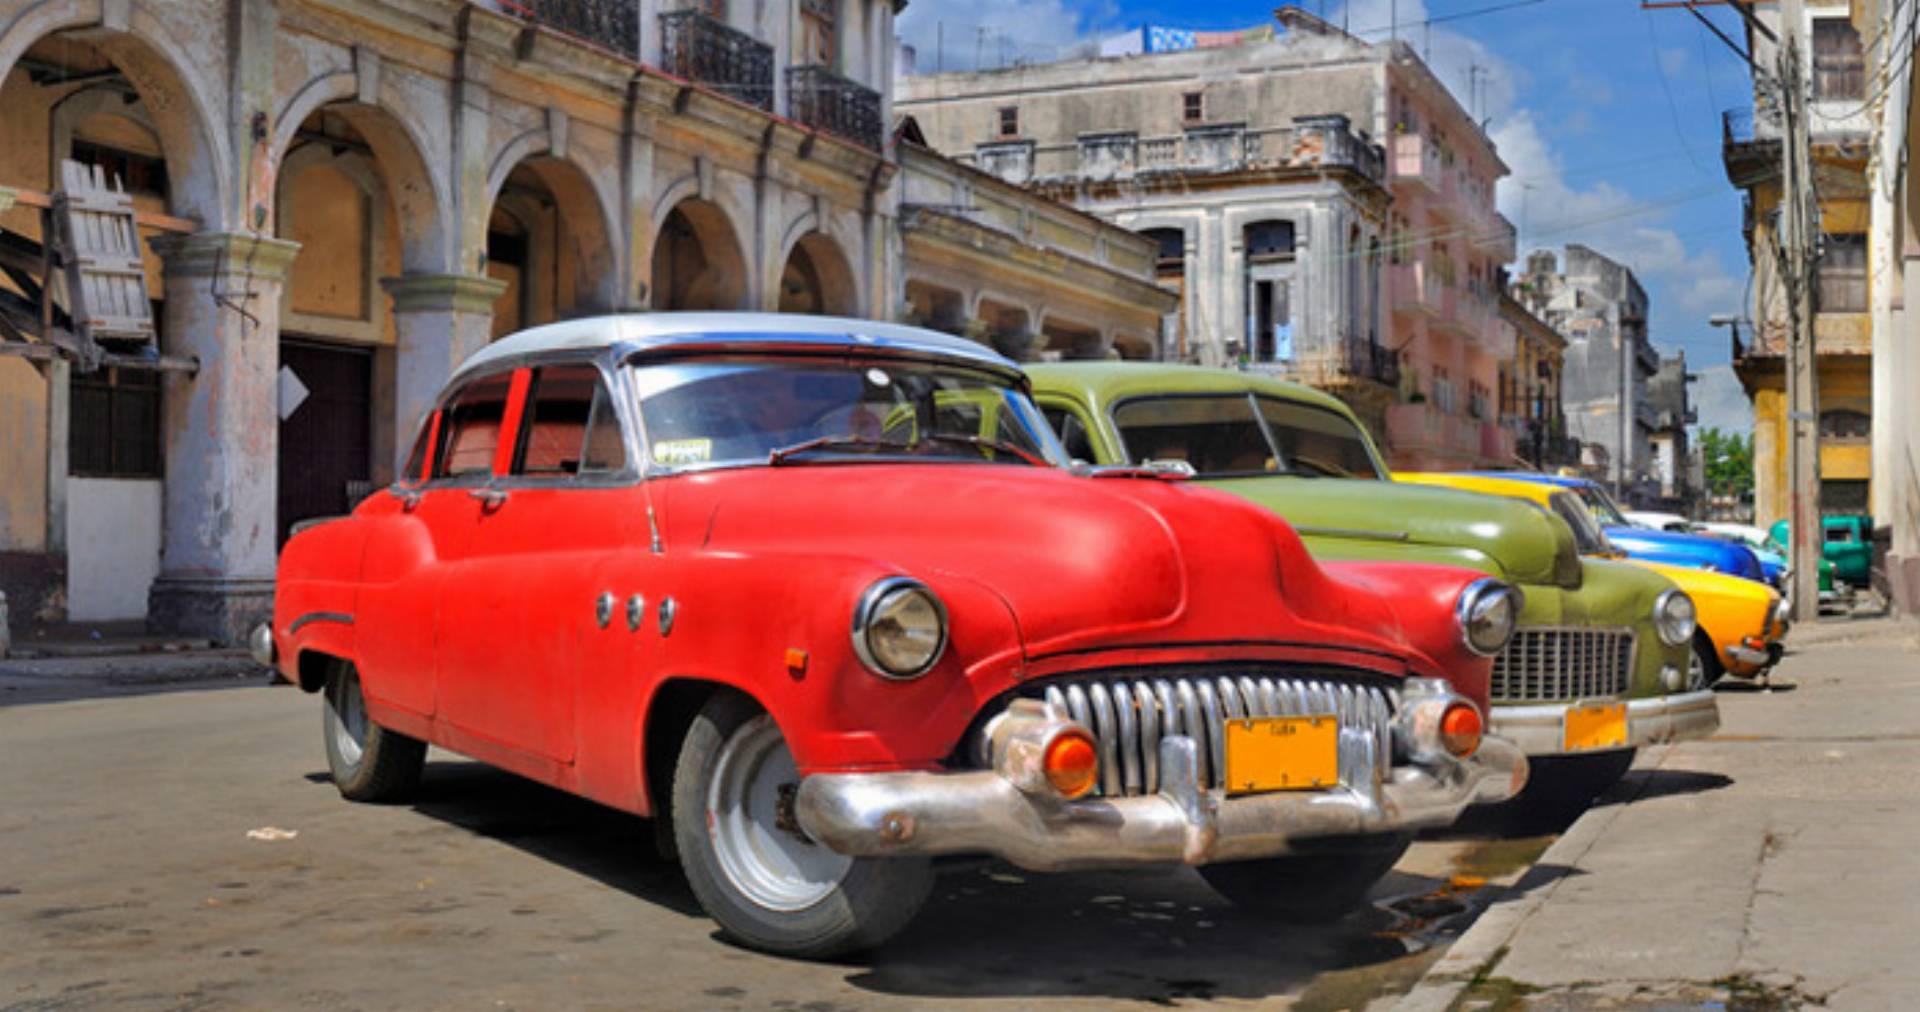 Kuba – źródło: iStock/Travelplanet.pl